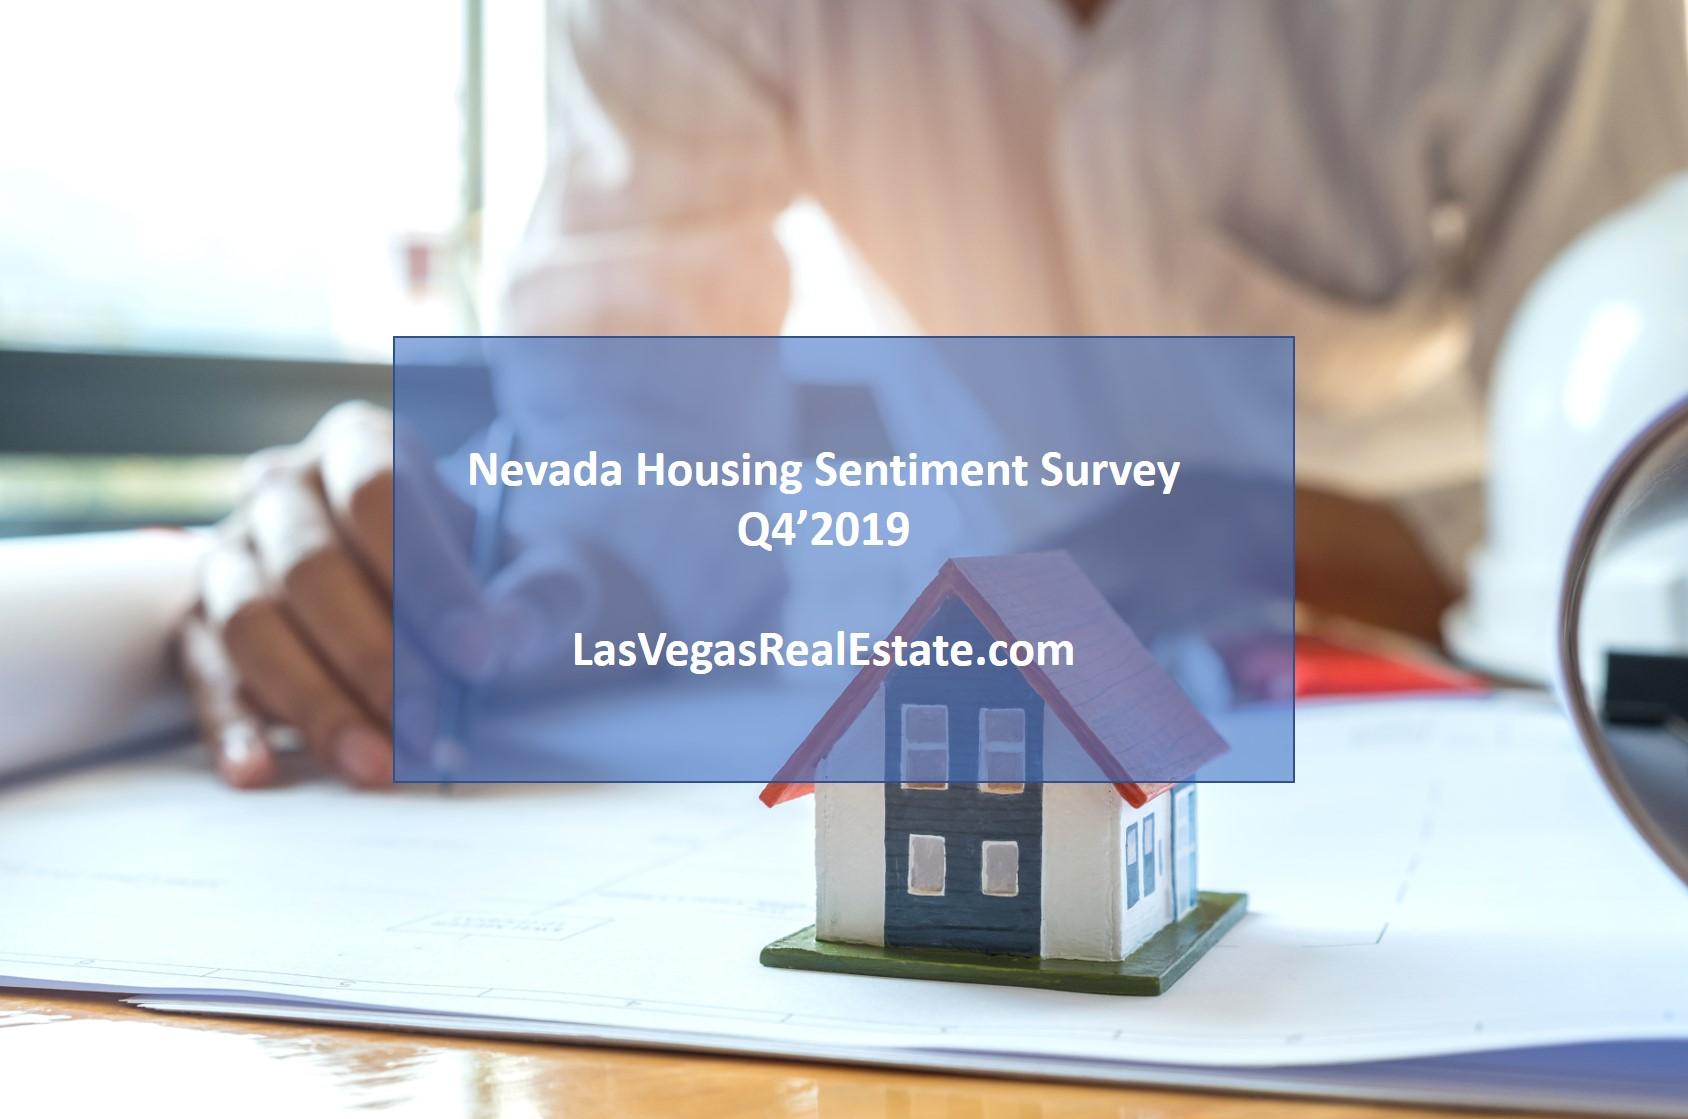 Nevada Housing Sentiment Survey Q4'2019